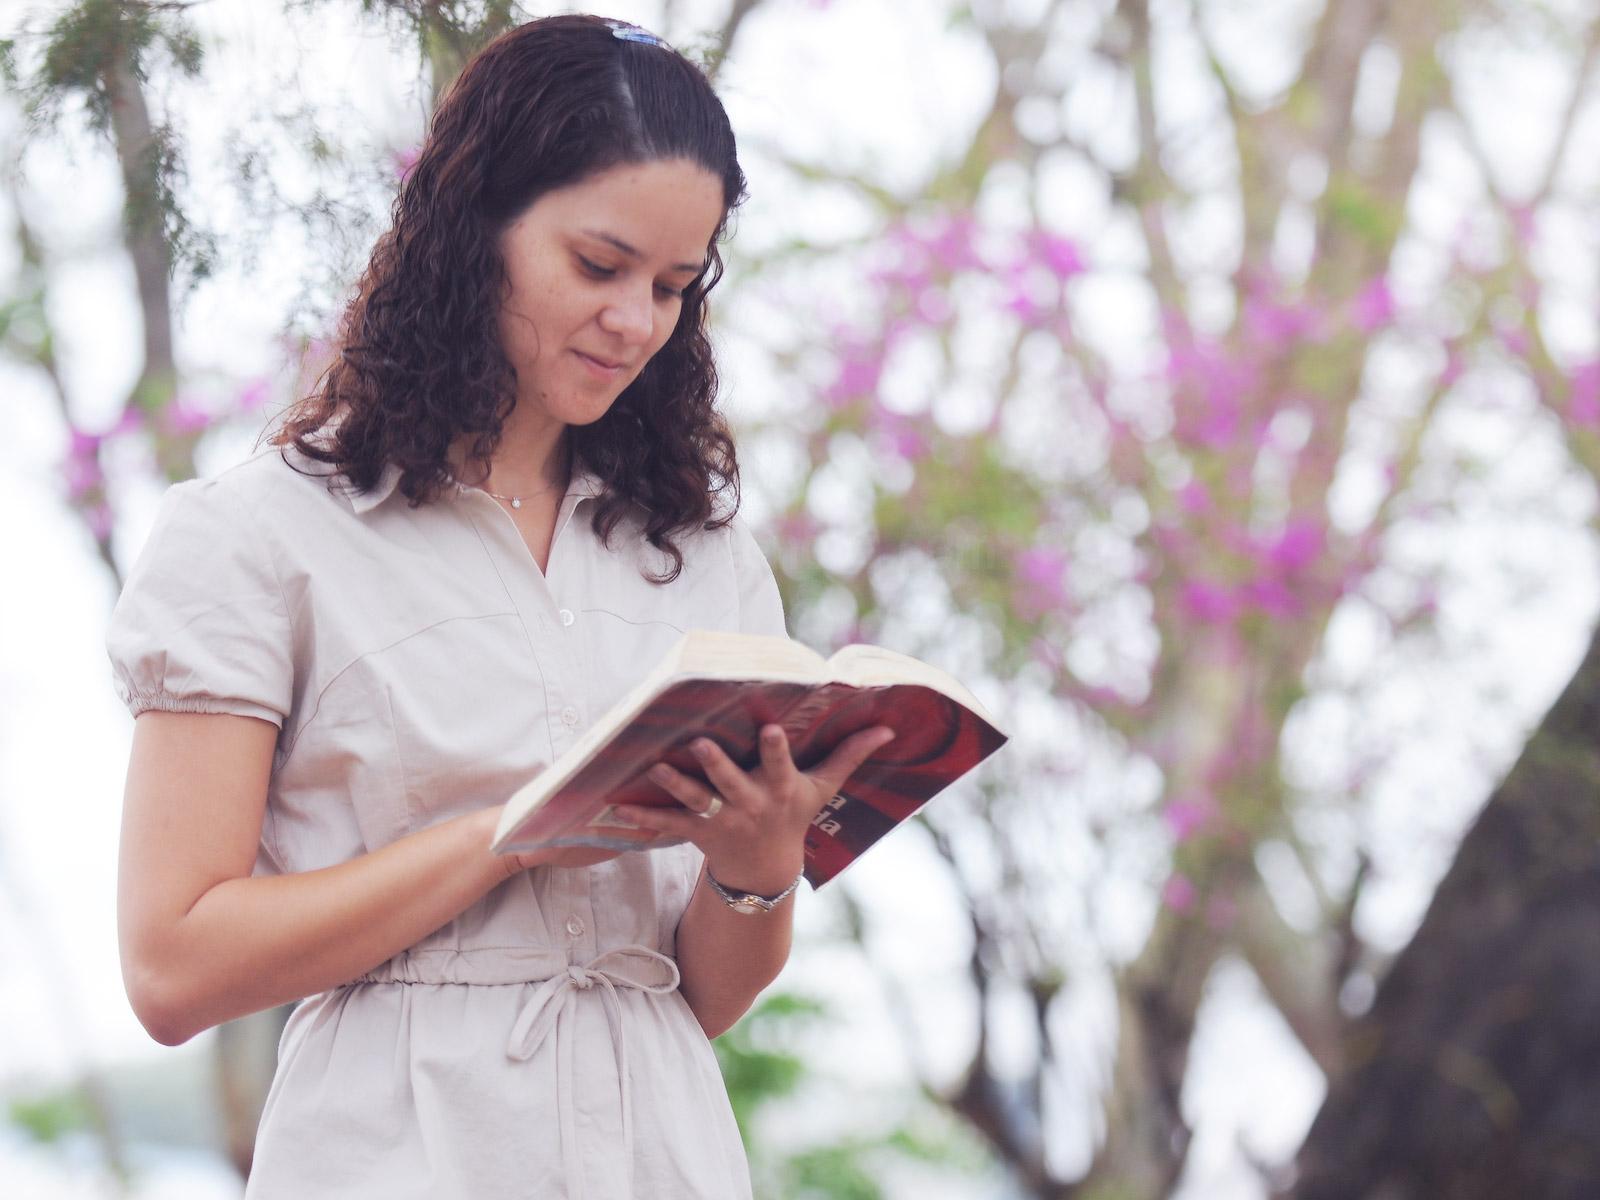 a_importancia_de_conhecer_a_deus_e_a_biblia